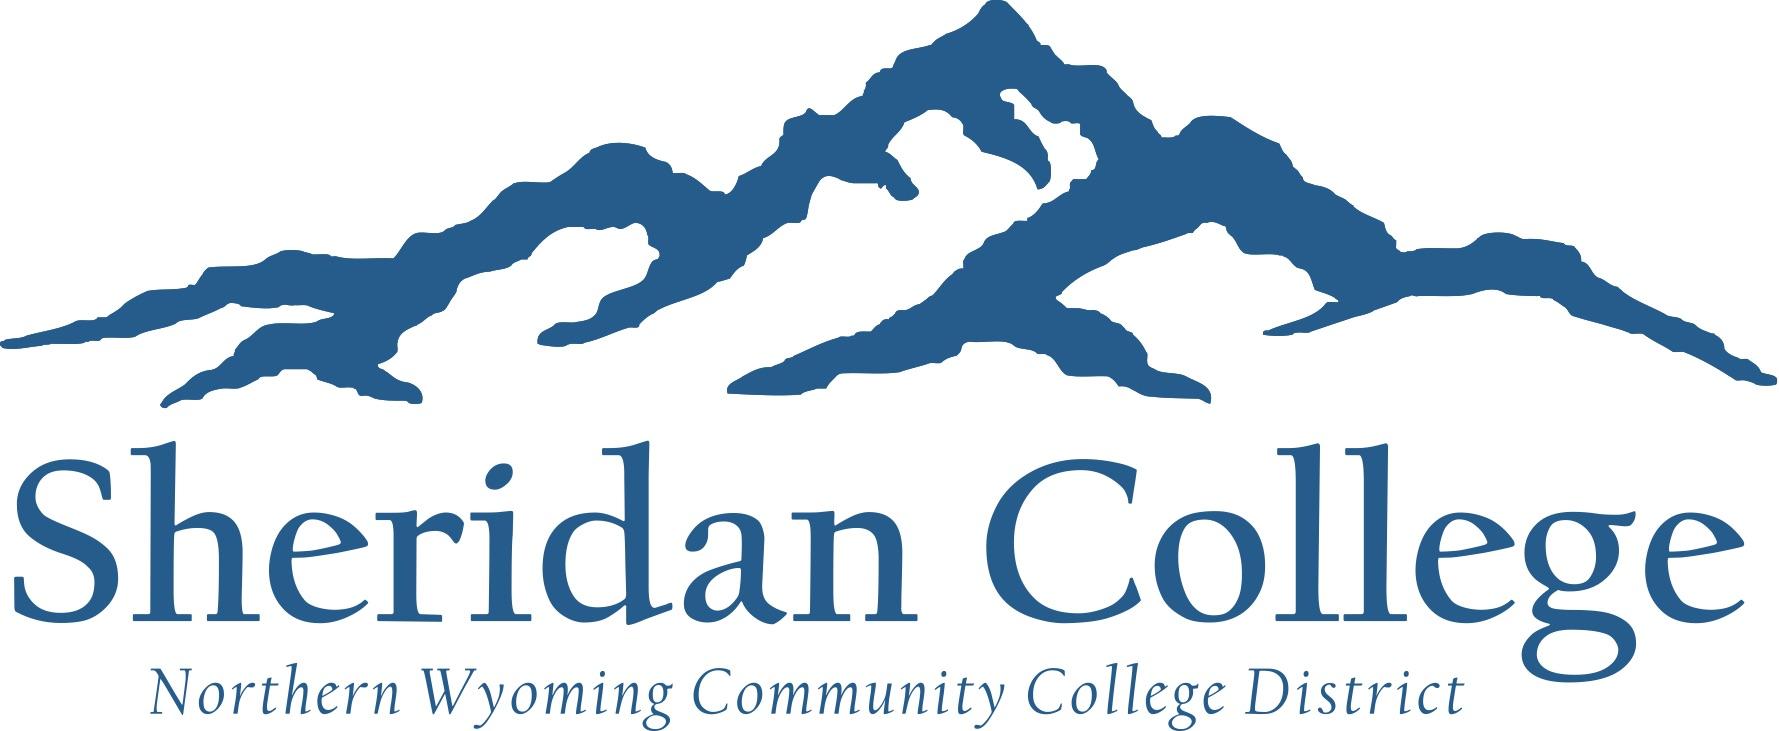 Sheridan_College_Logo_drkblueFINAL.jpg